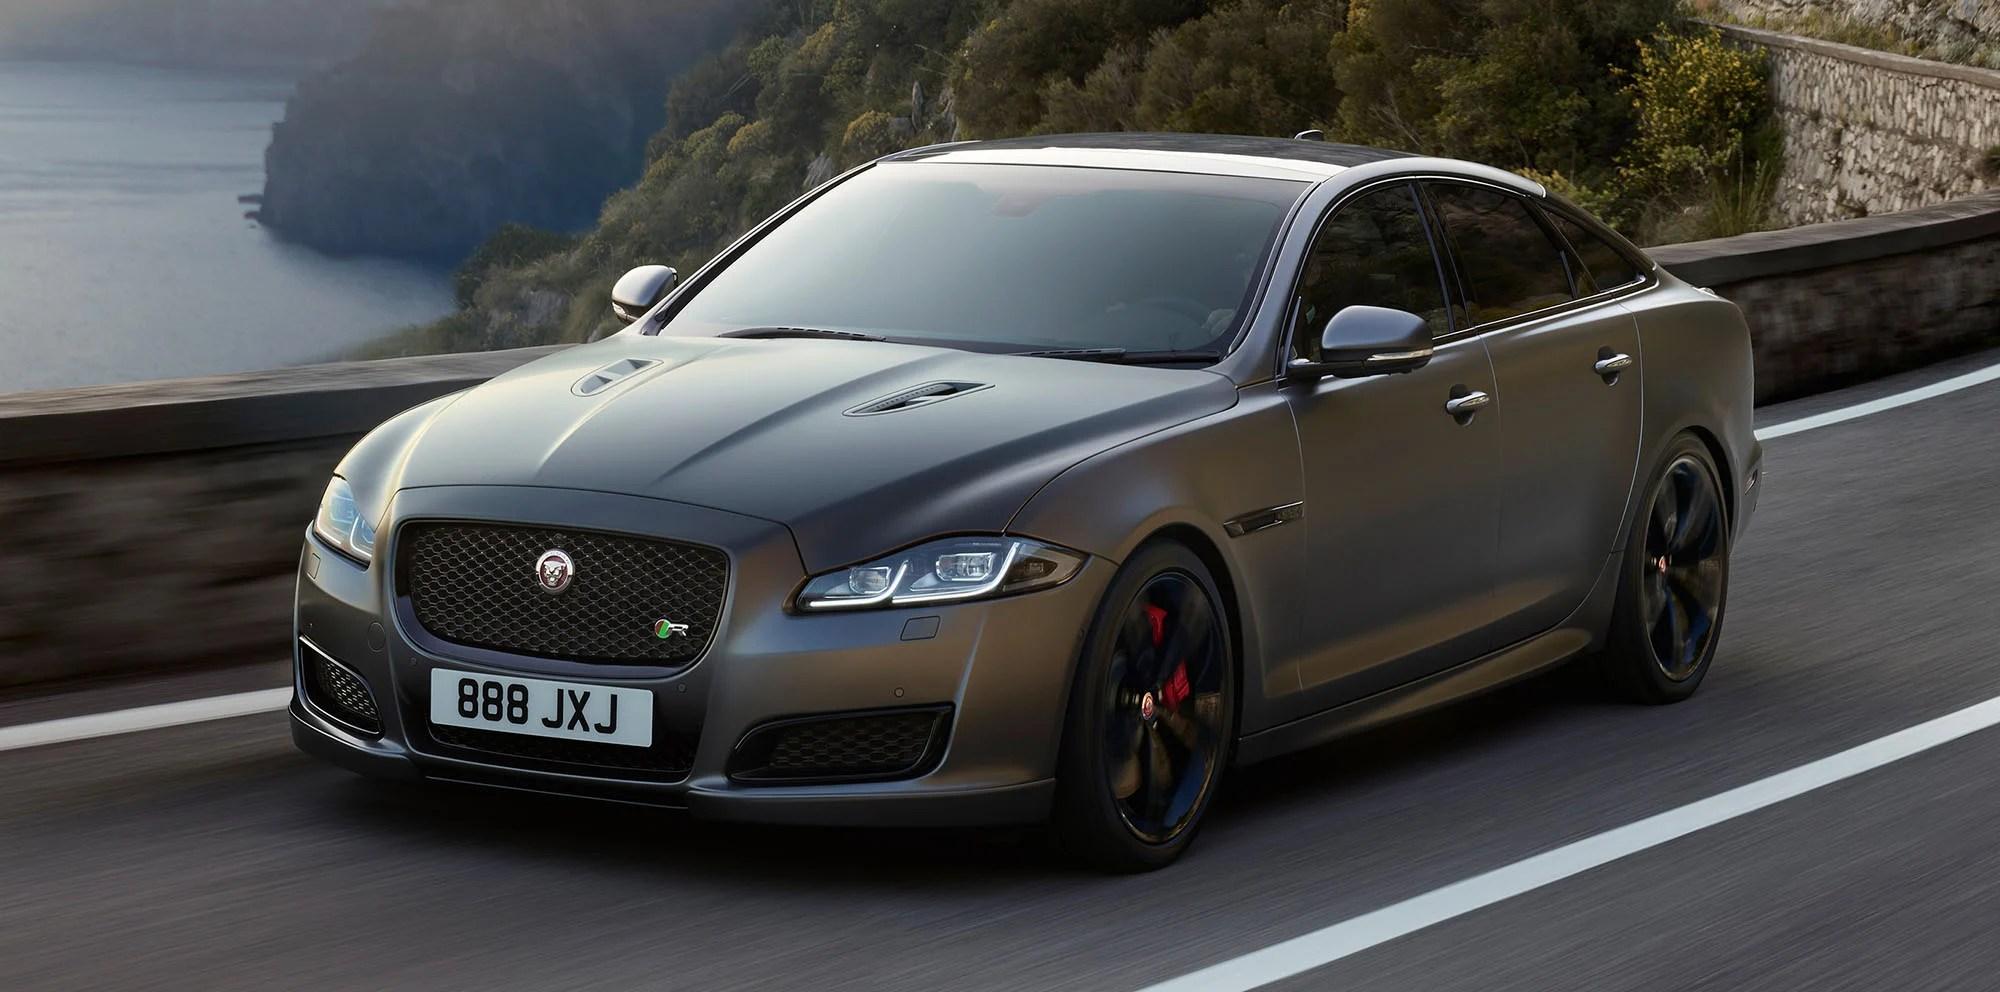 Matte Black Luxury Car Wallpaper 2018 Jaguar Xjr575 Headlines Updated Range Australian